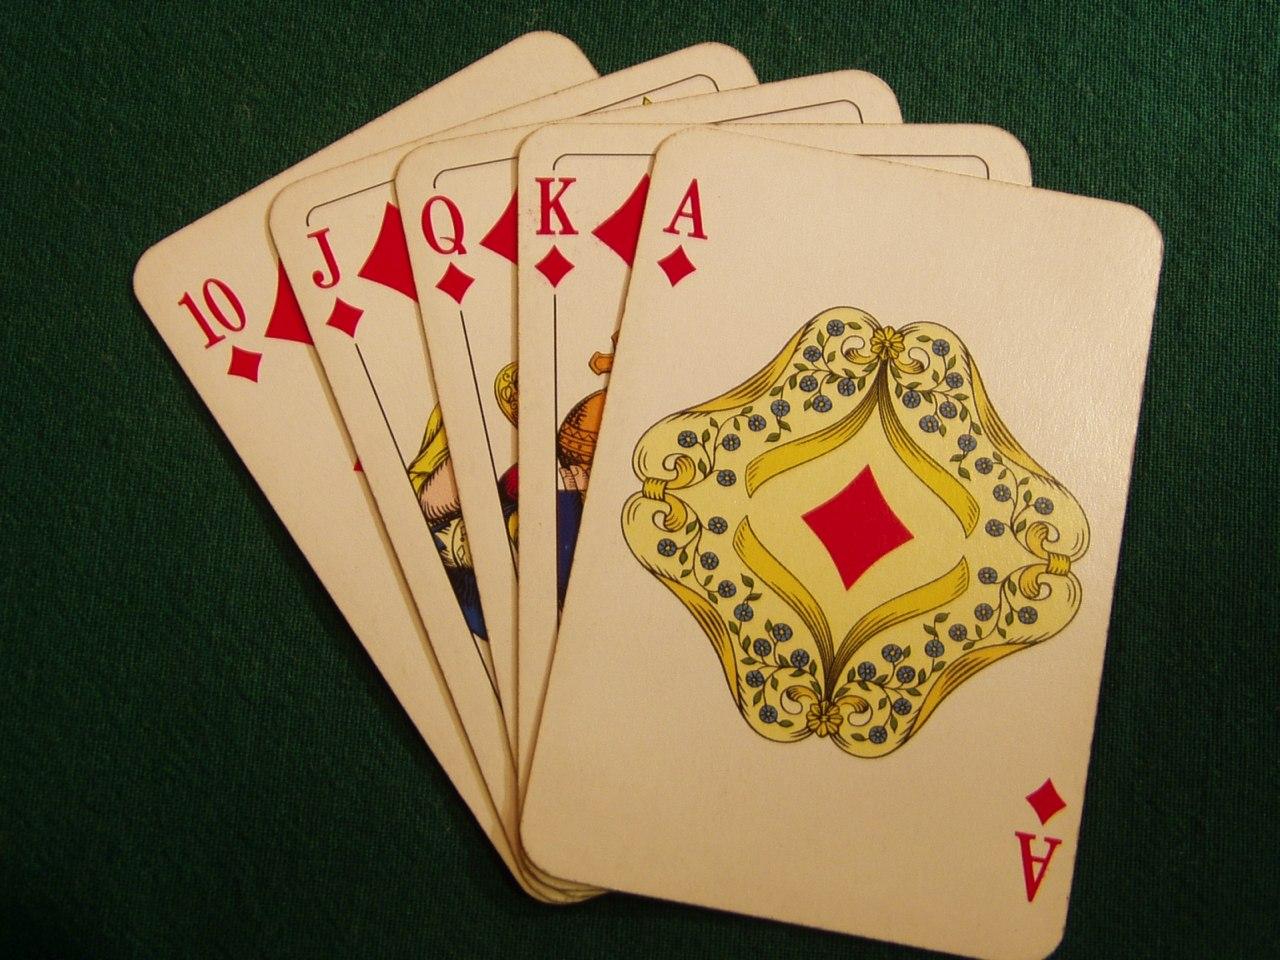 Ⓦallⓟapers Sfondi Poker